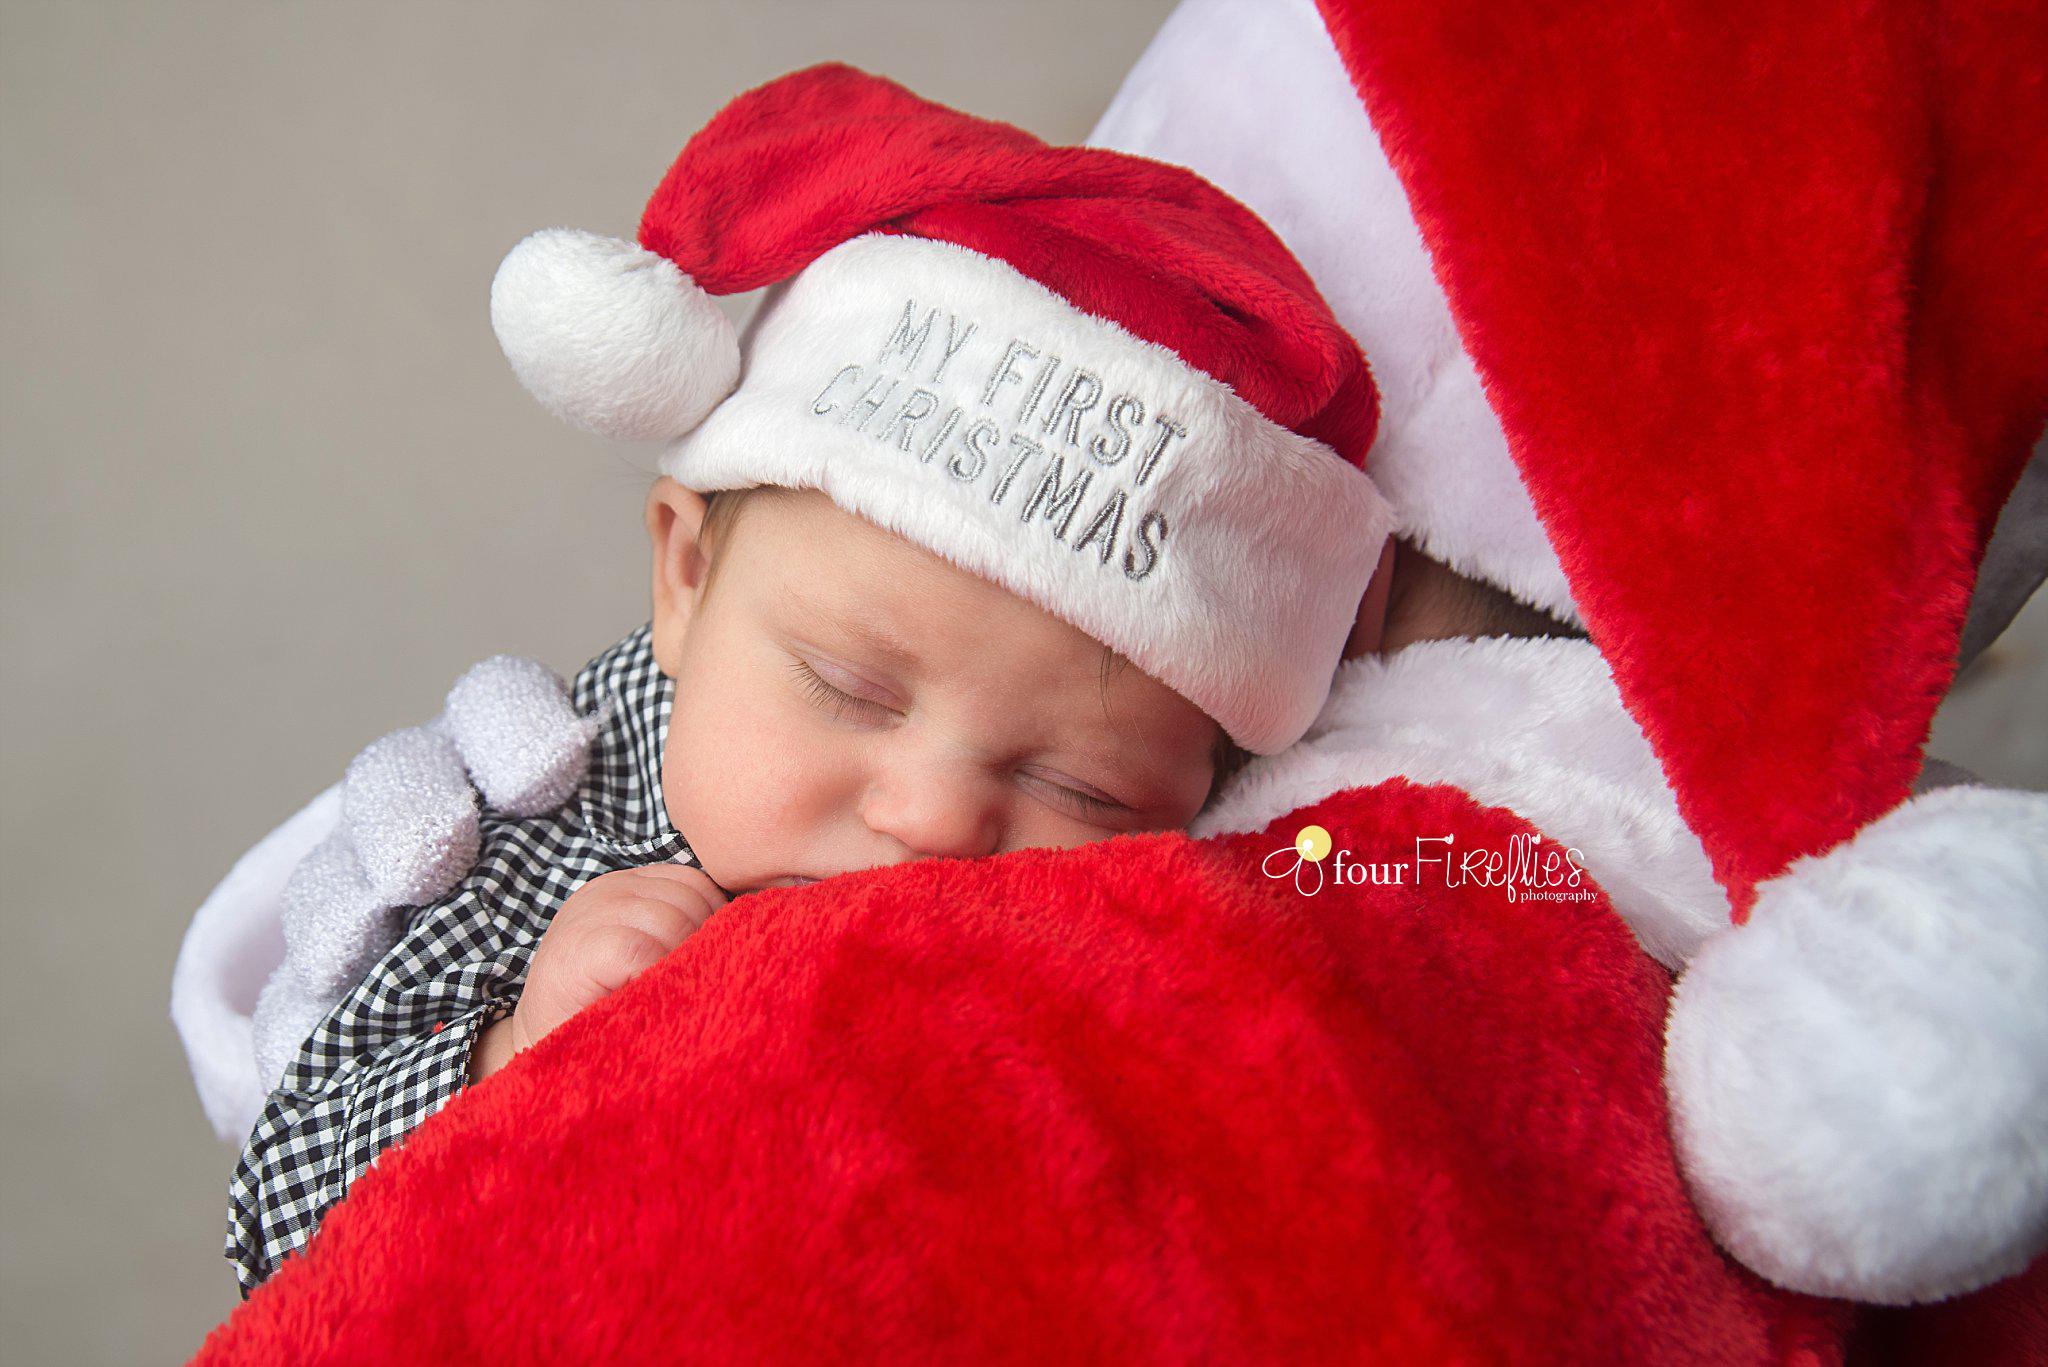 st-louis-newborn-photographer-christmas-baby-baby-in-first-christmas-hat-sleeping-on-santas-shoulder.jpg